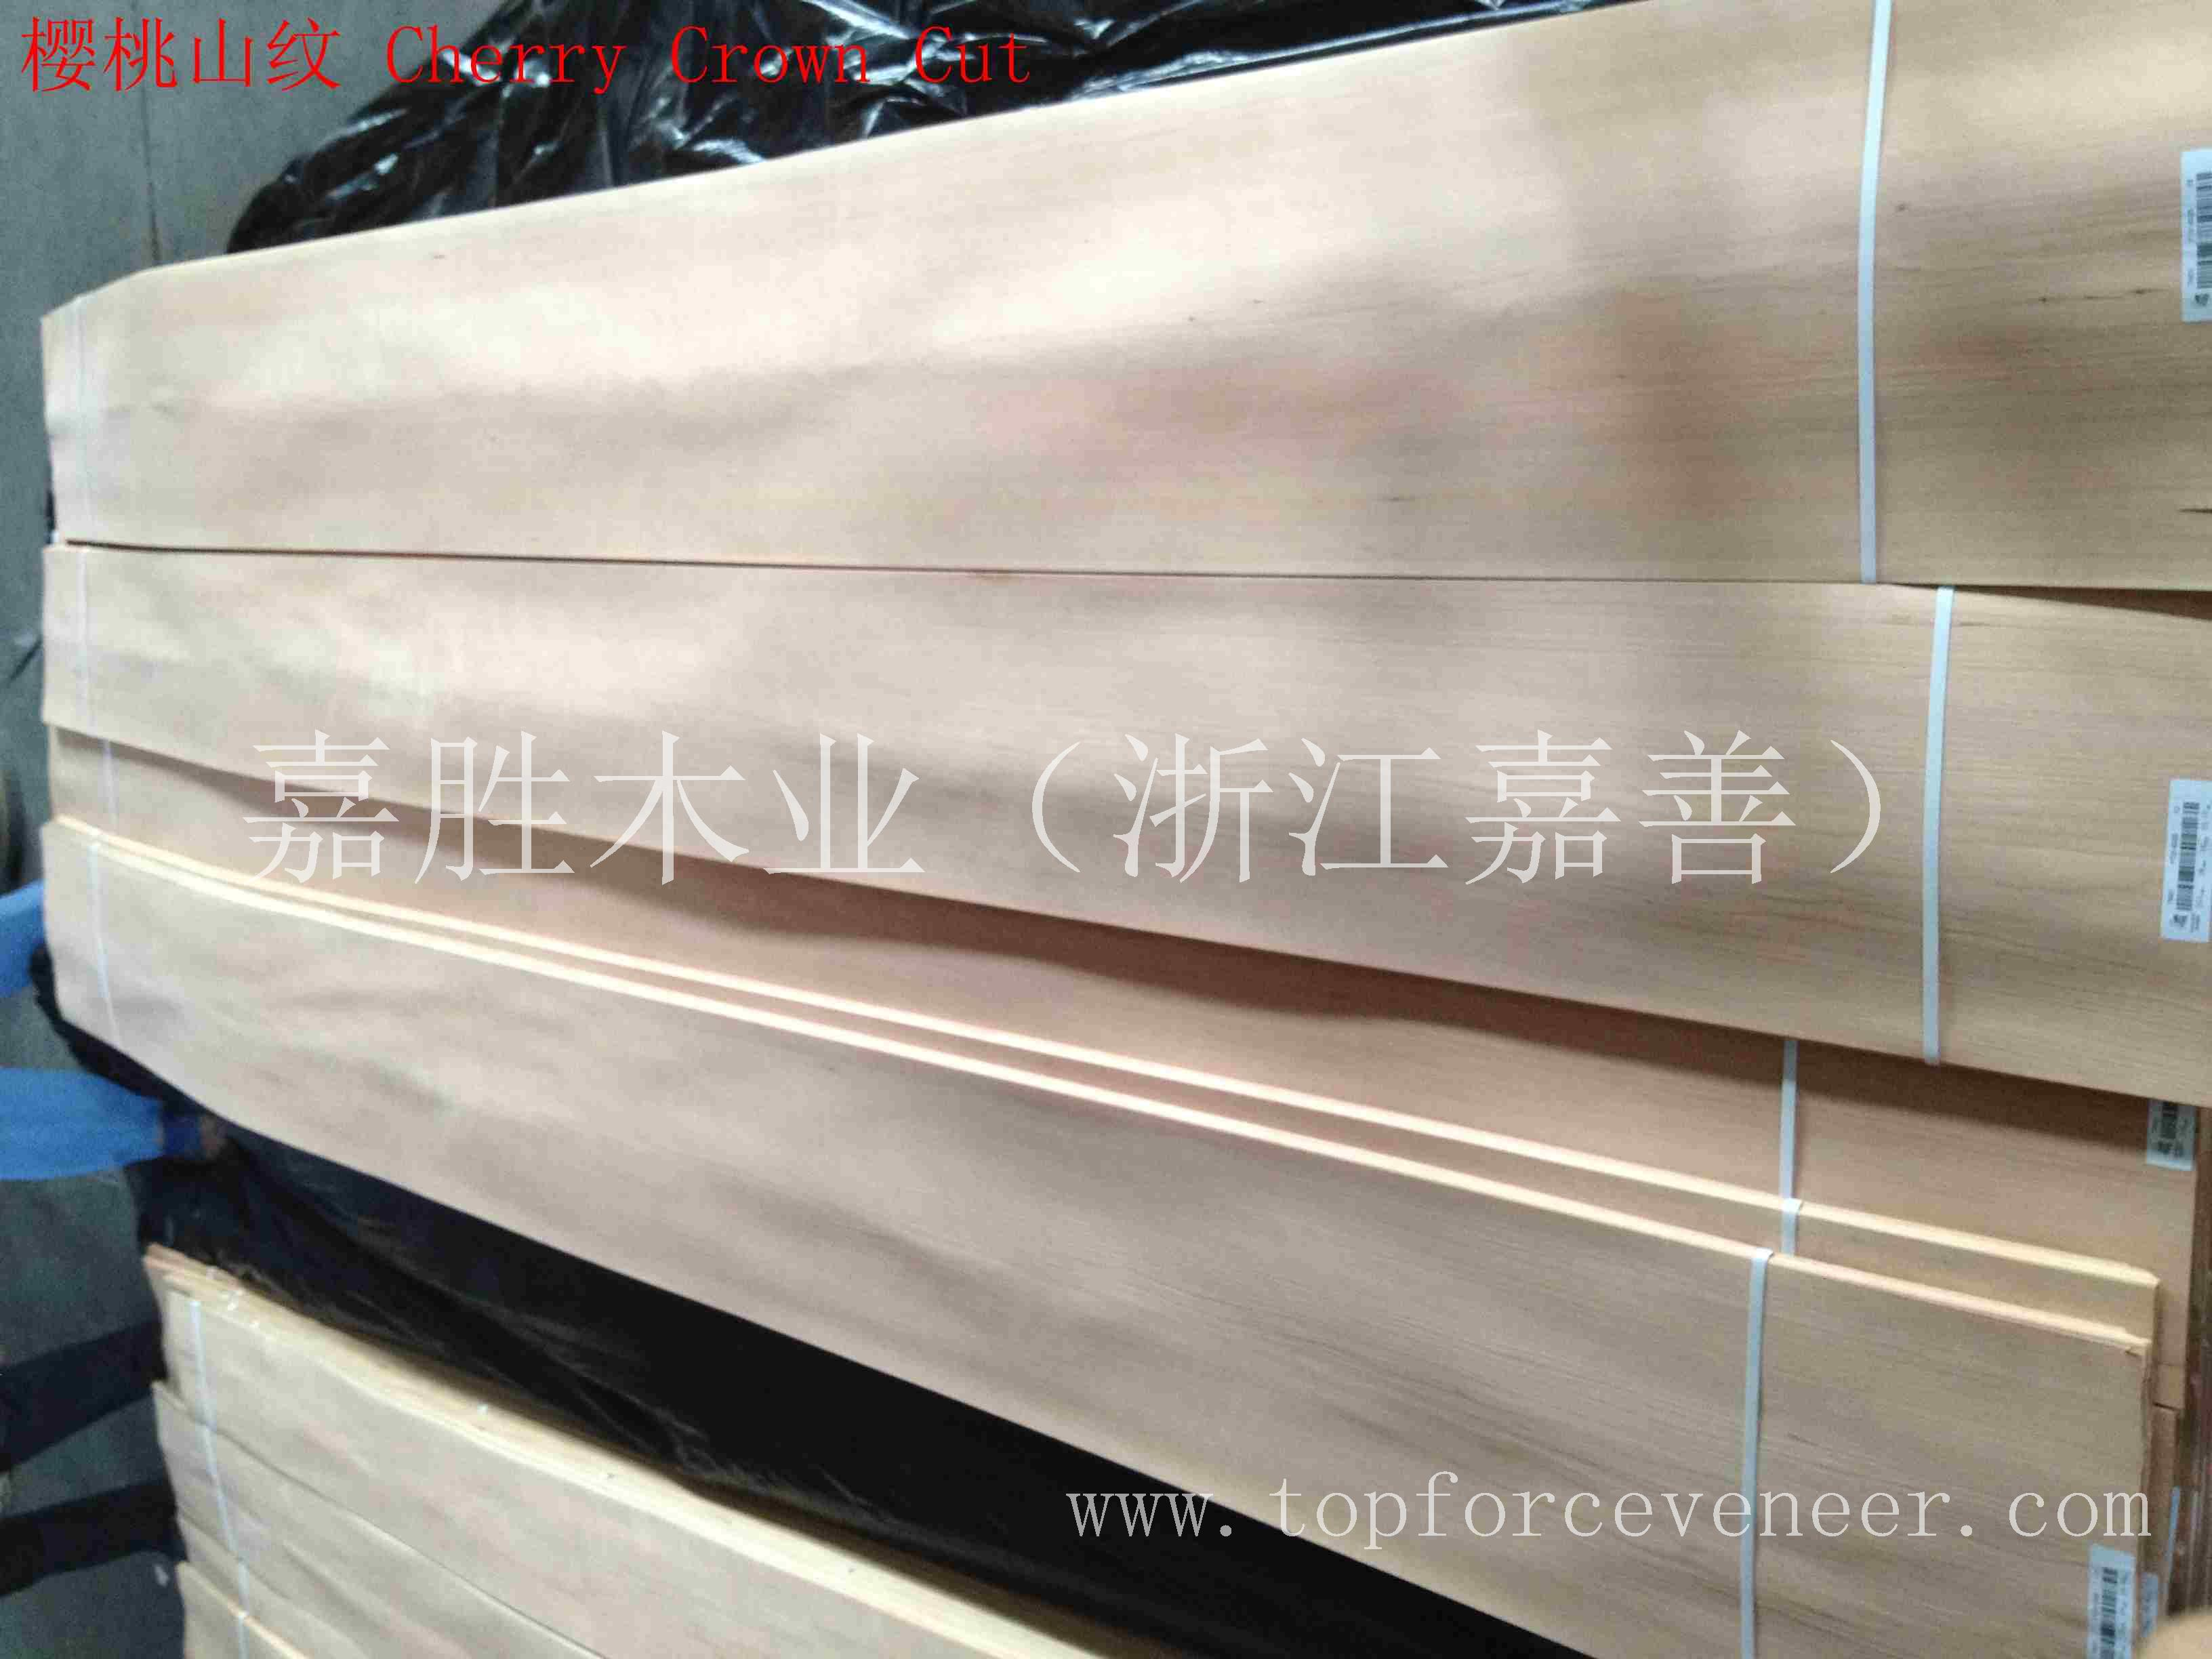 上海美国樱桃小花木皮-ShangHai American Black Cherry Tiny Cathydral Veneer architecture grade